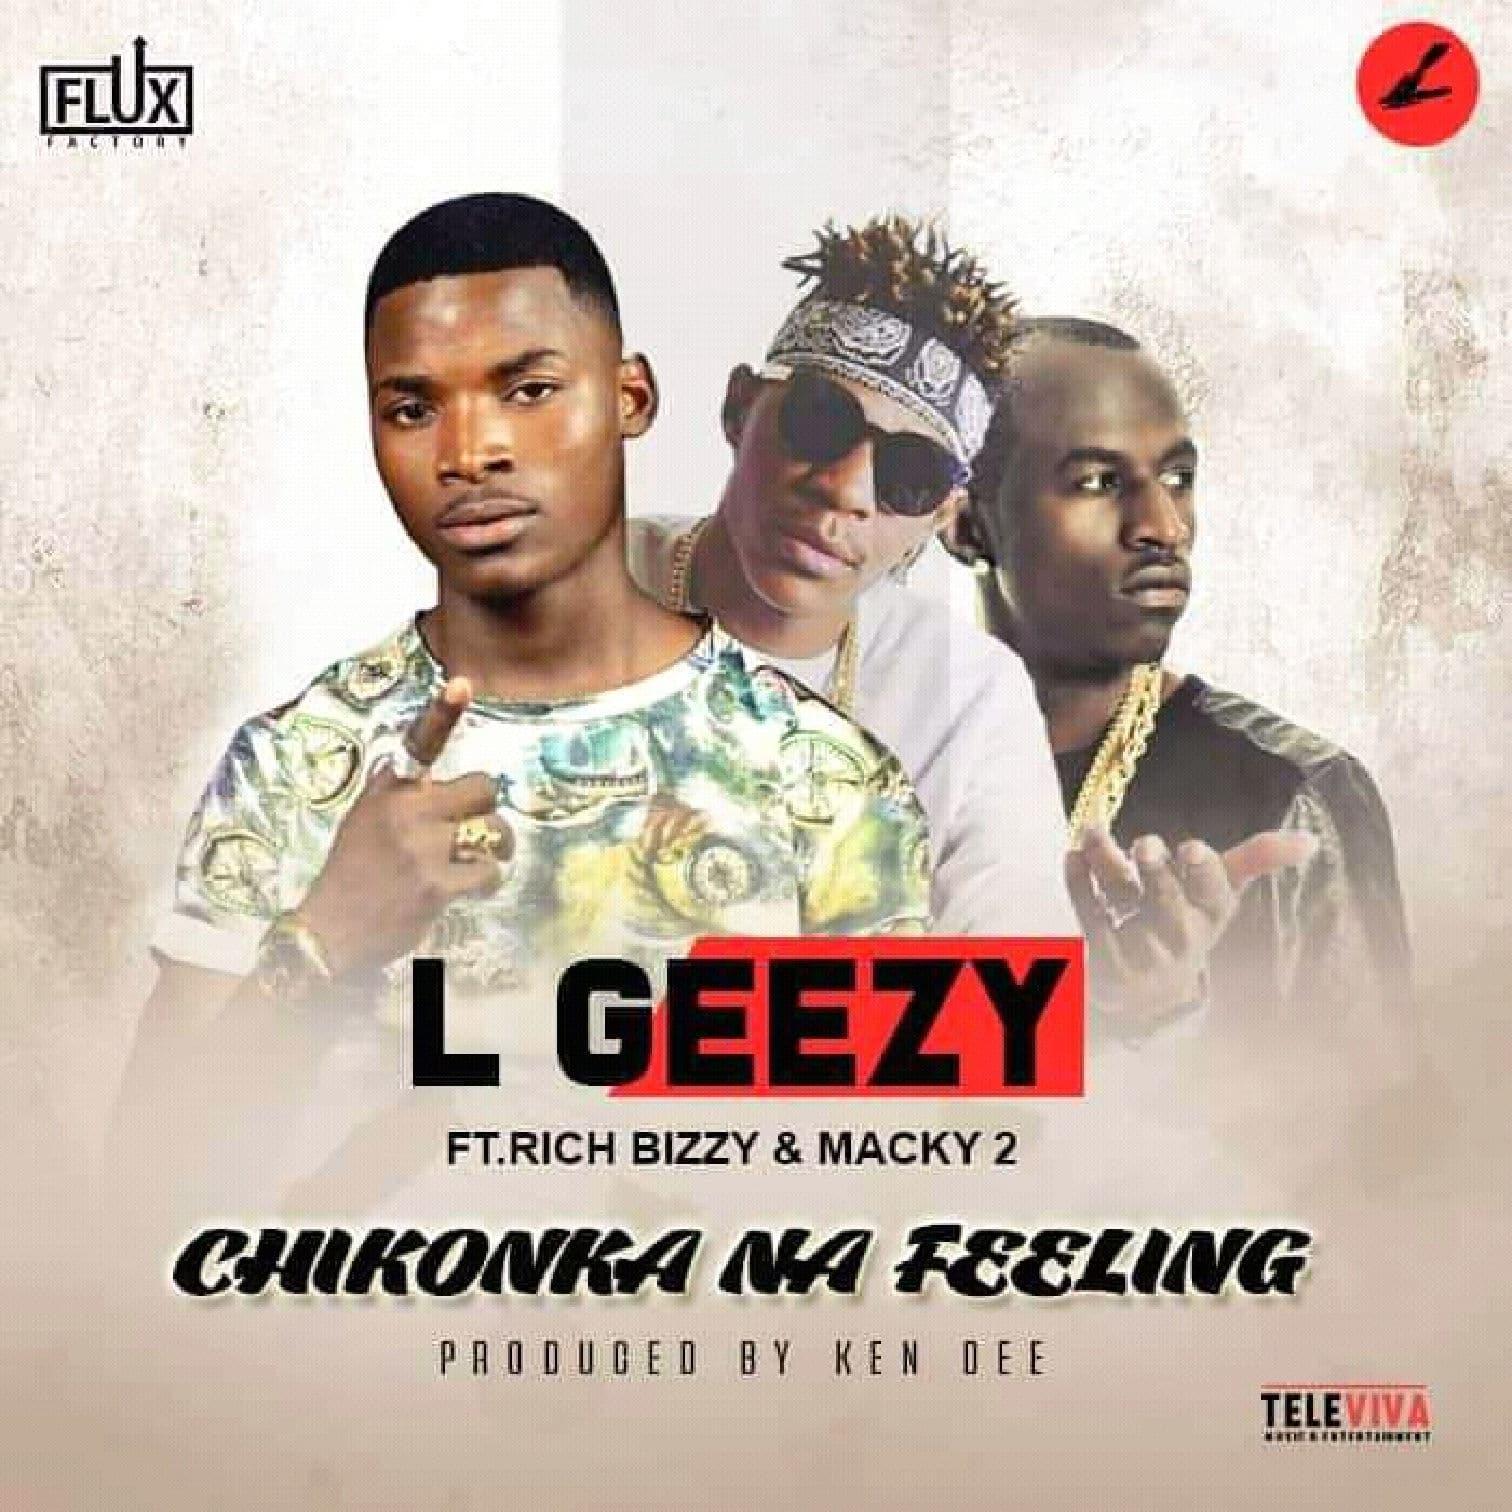 L Geezy Ft. Rich Bizzy Macky 2 Chikonka Na Feeling